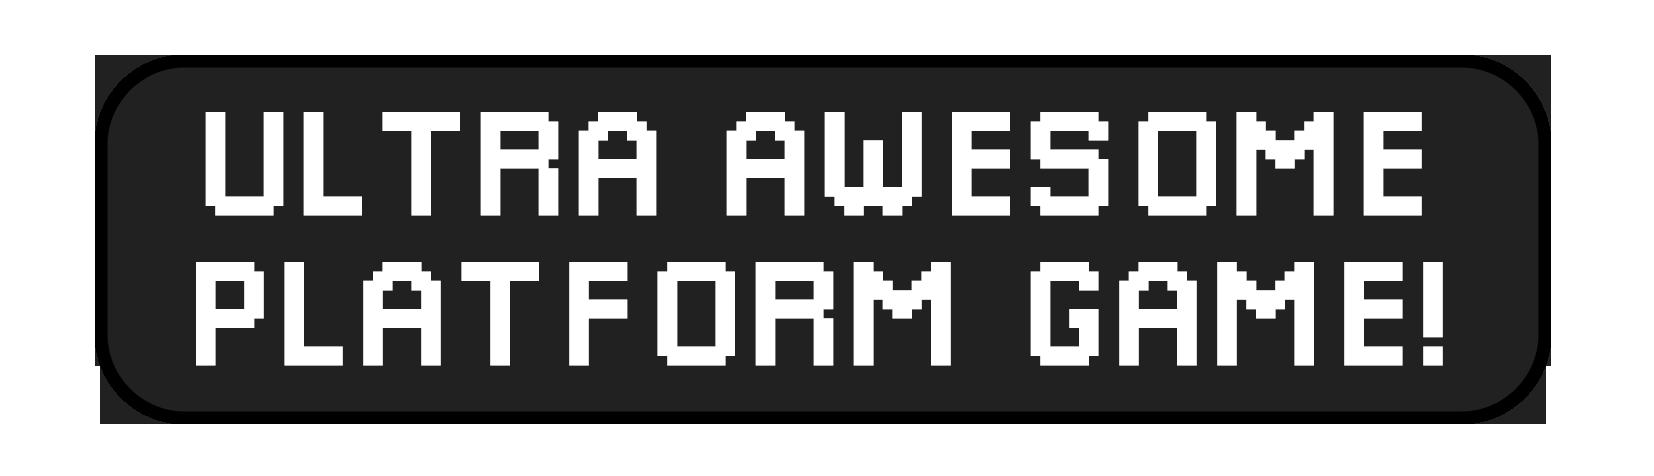 Ultra Awesome Platform Game!